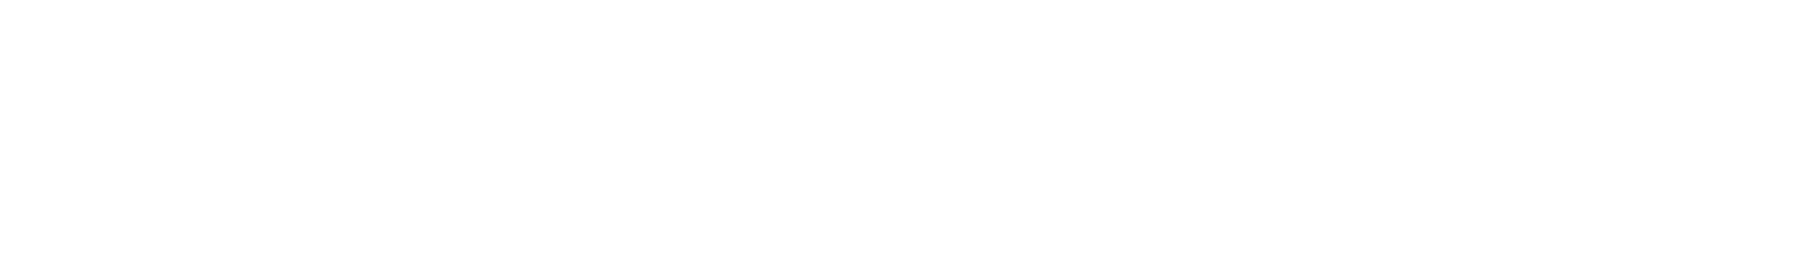 guitarblues12 120